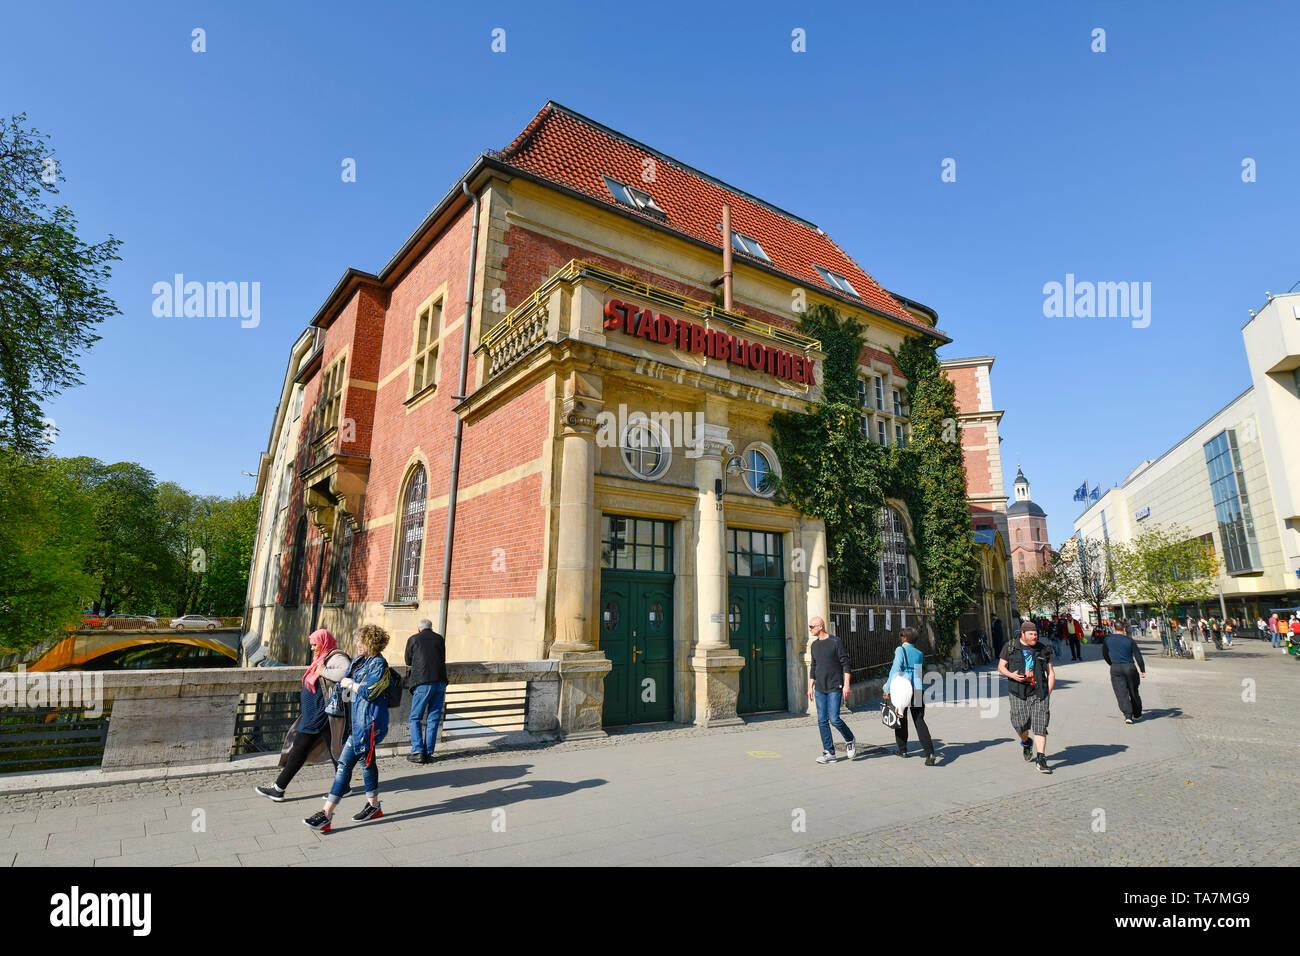 Town library, Carl apron street, Old Town, Spandau, Berlin, Germany, Stadtbibliothek, Carl-Schurz-Straße, Altstadt, Deutschland - Stock Image